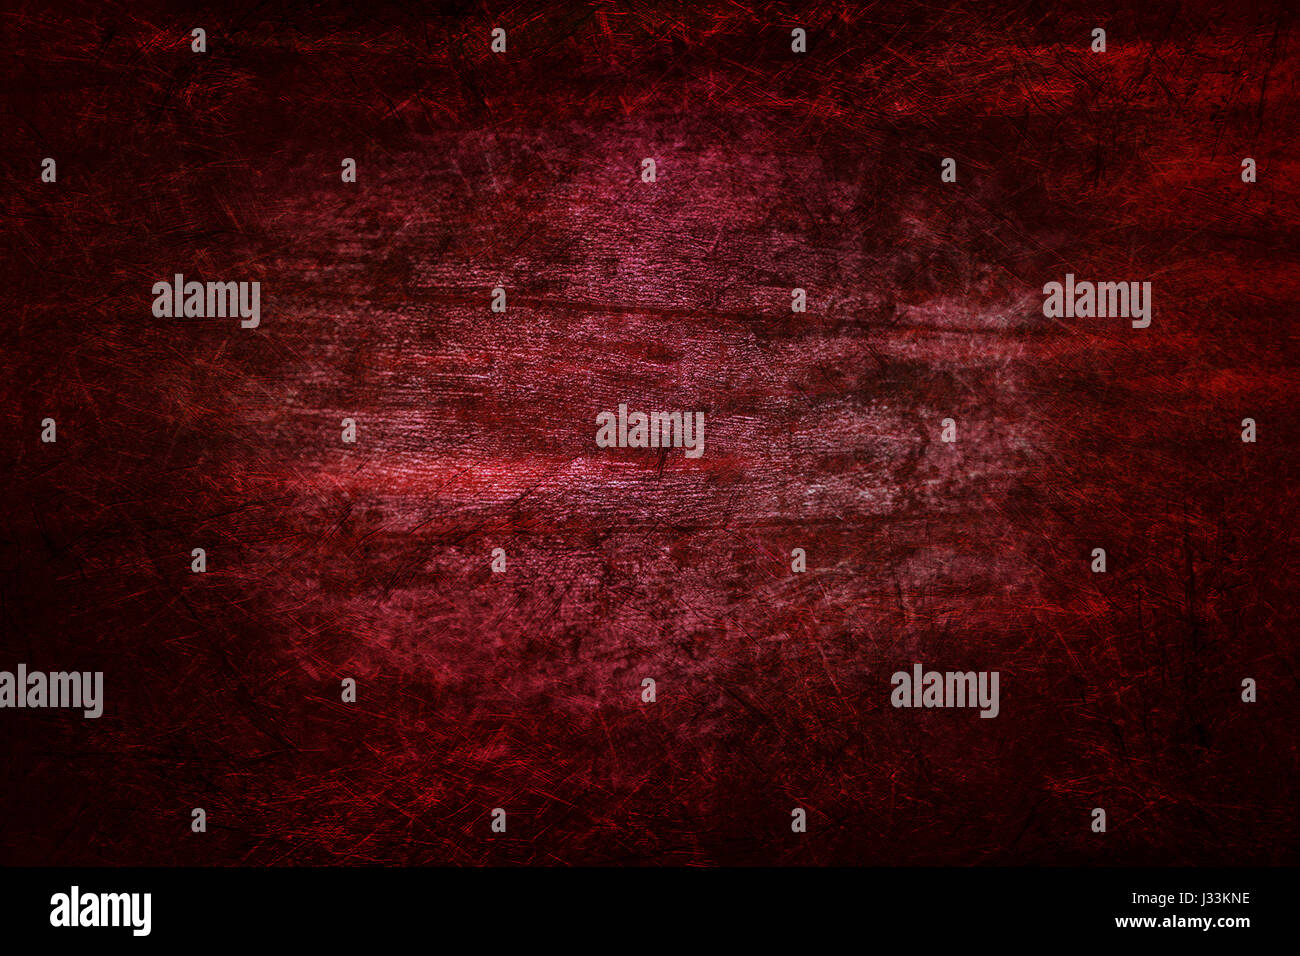 Hintergrund rot Immagini Stock